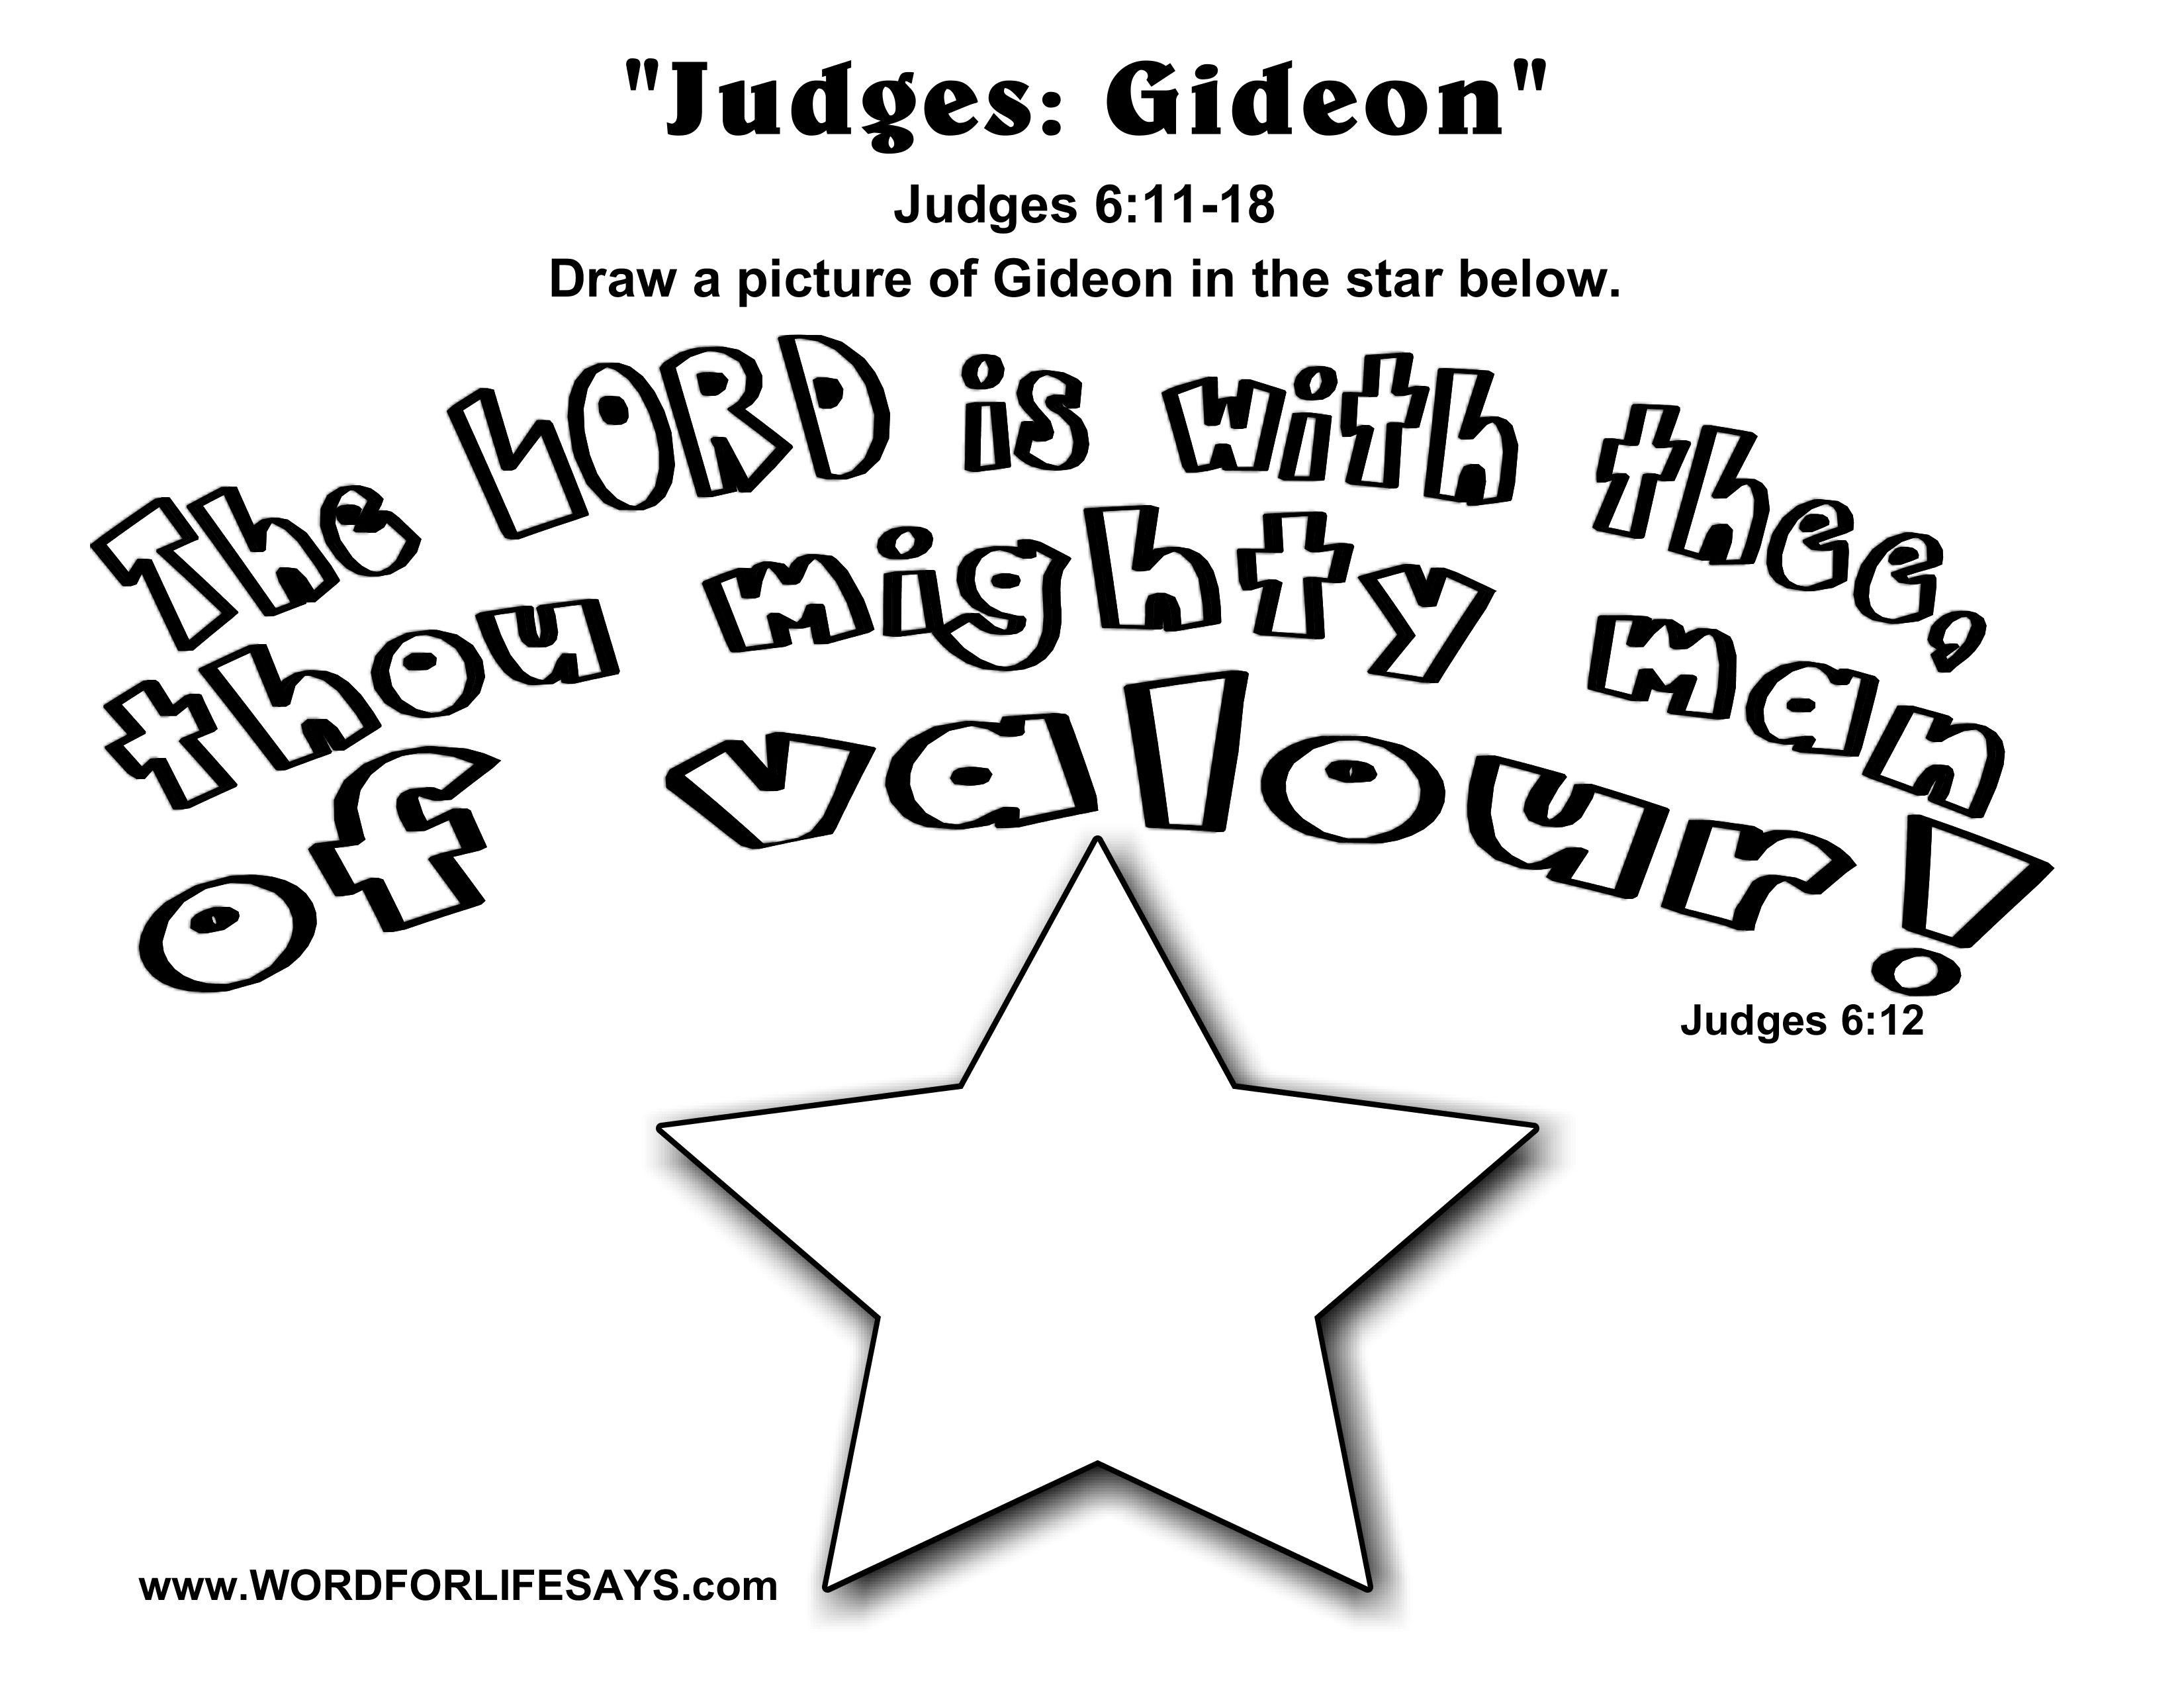 judges gideon u201d sunday lesson summary for judges 6 11 18